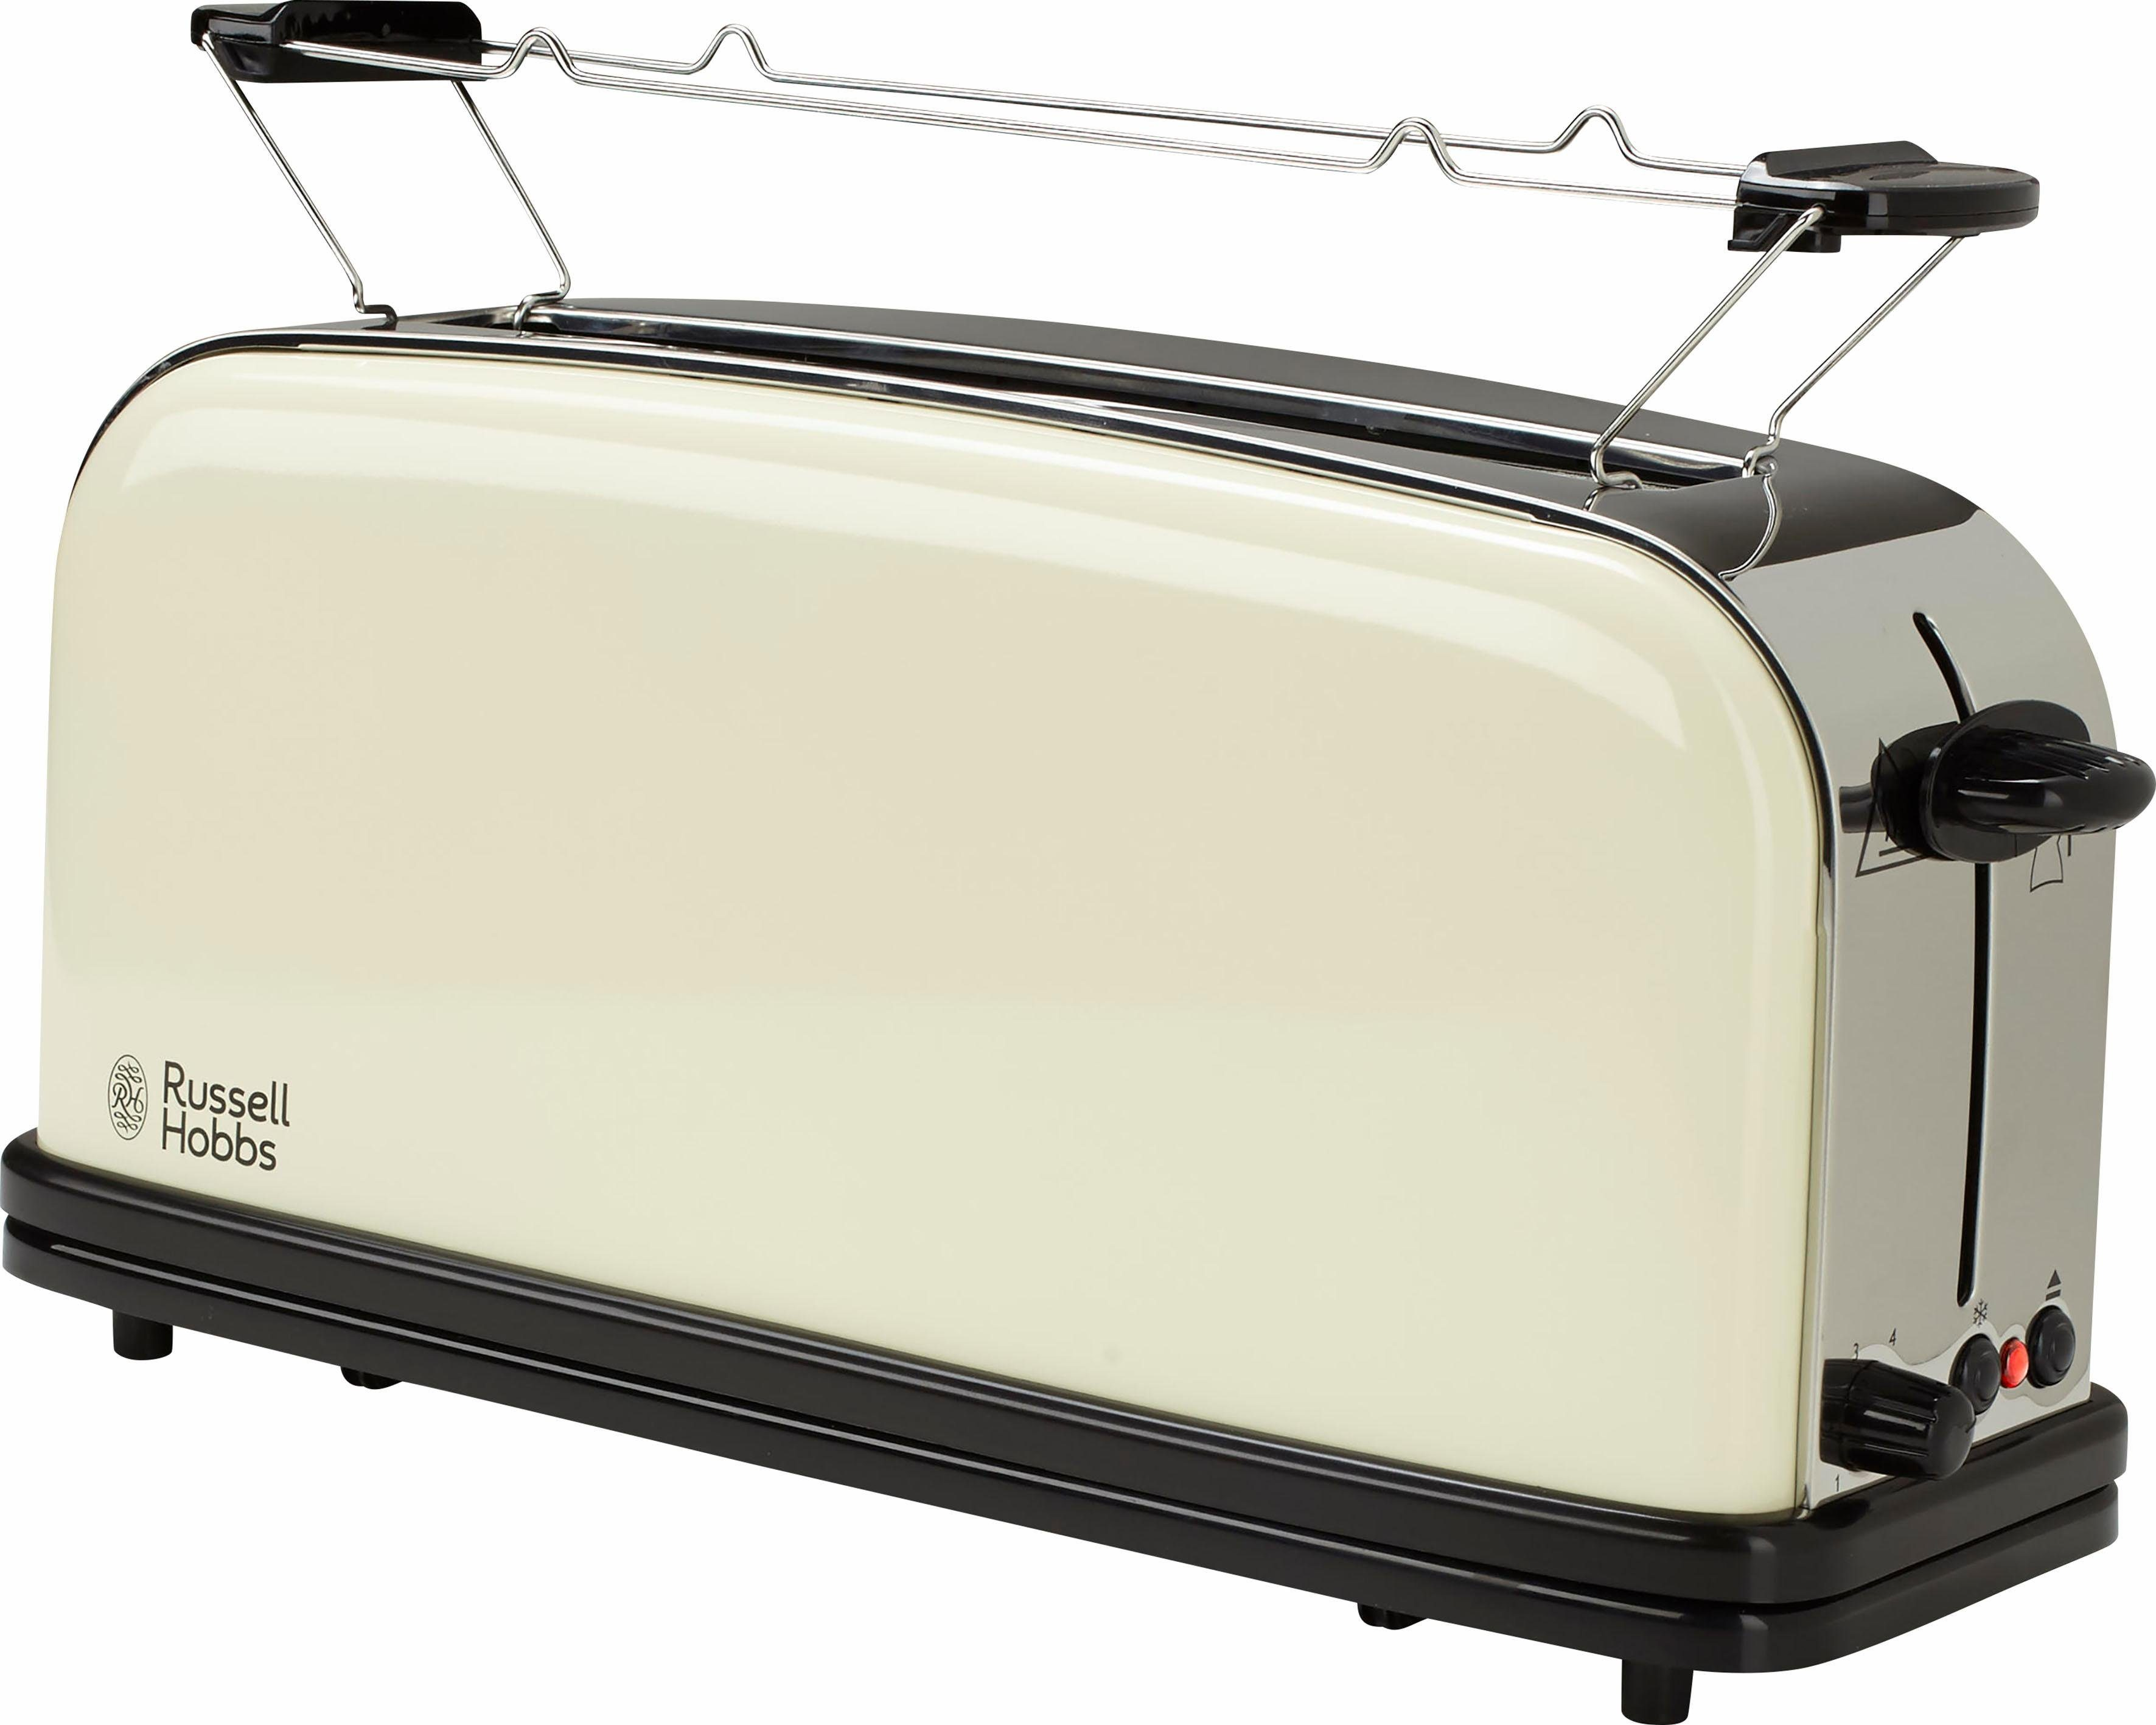 RUSSELL HOBBS Toaster Colours Plus+ 21395-56, 1 langer Schlitz, 1000 W